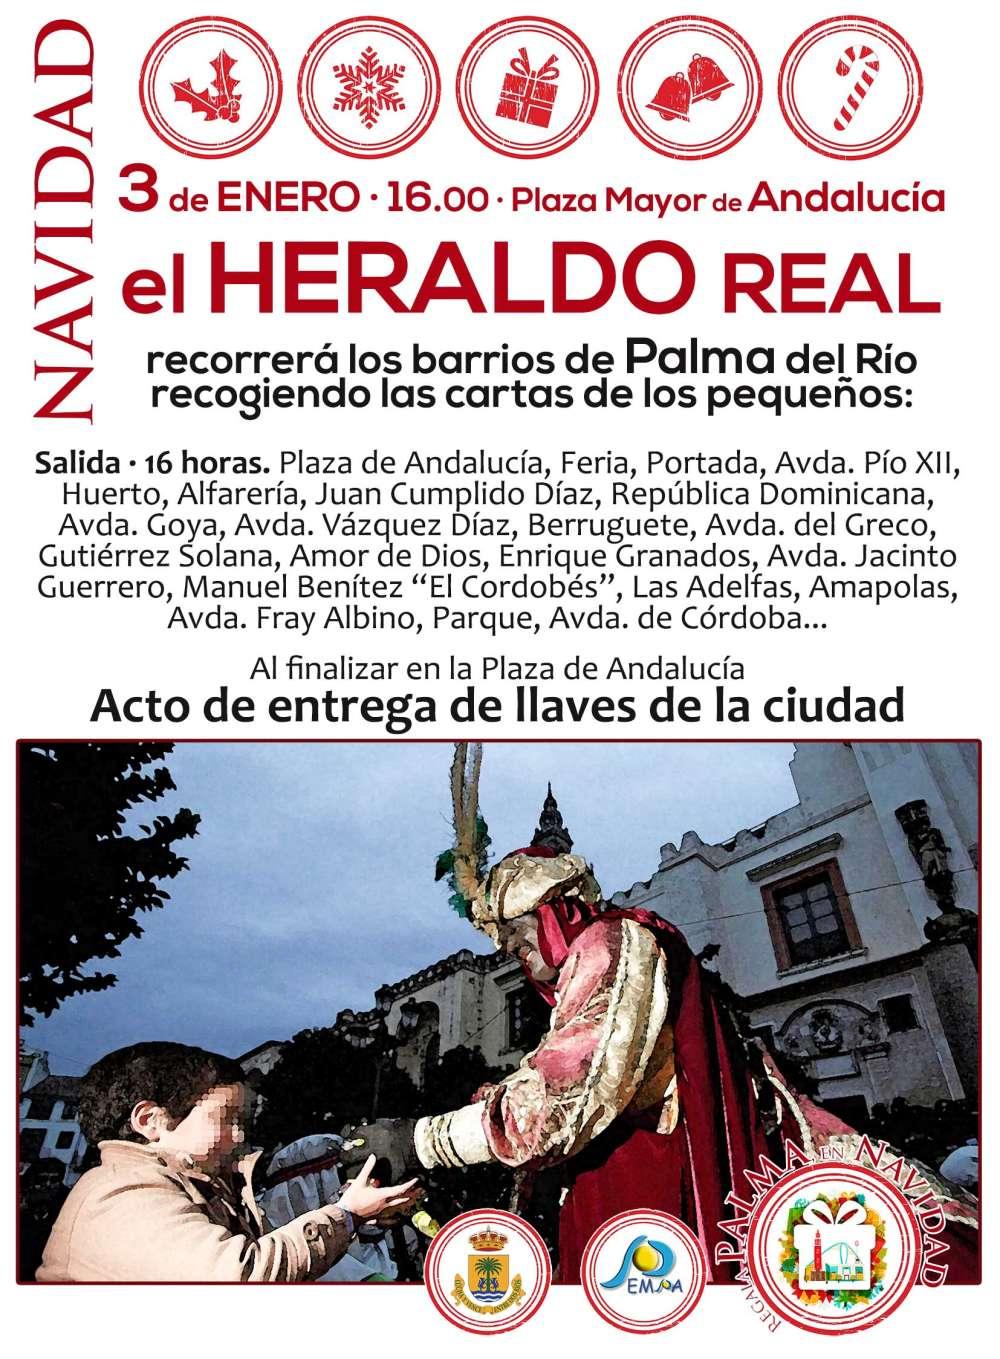 https://www.palmadelrio.es/sites/default/files/webheraldo-2019.jpg